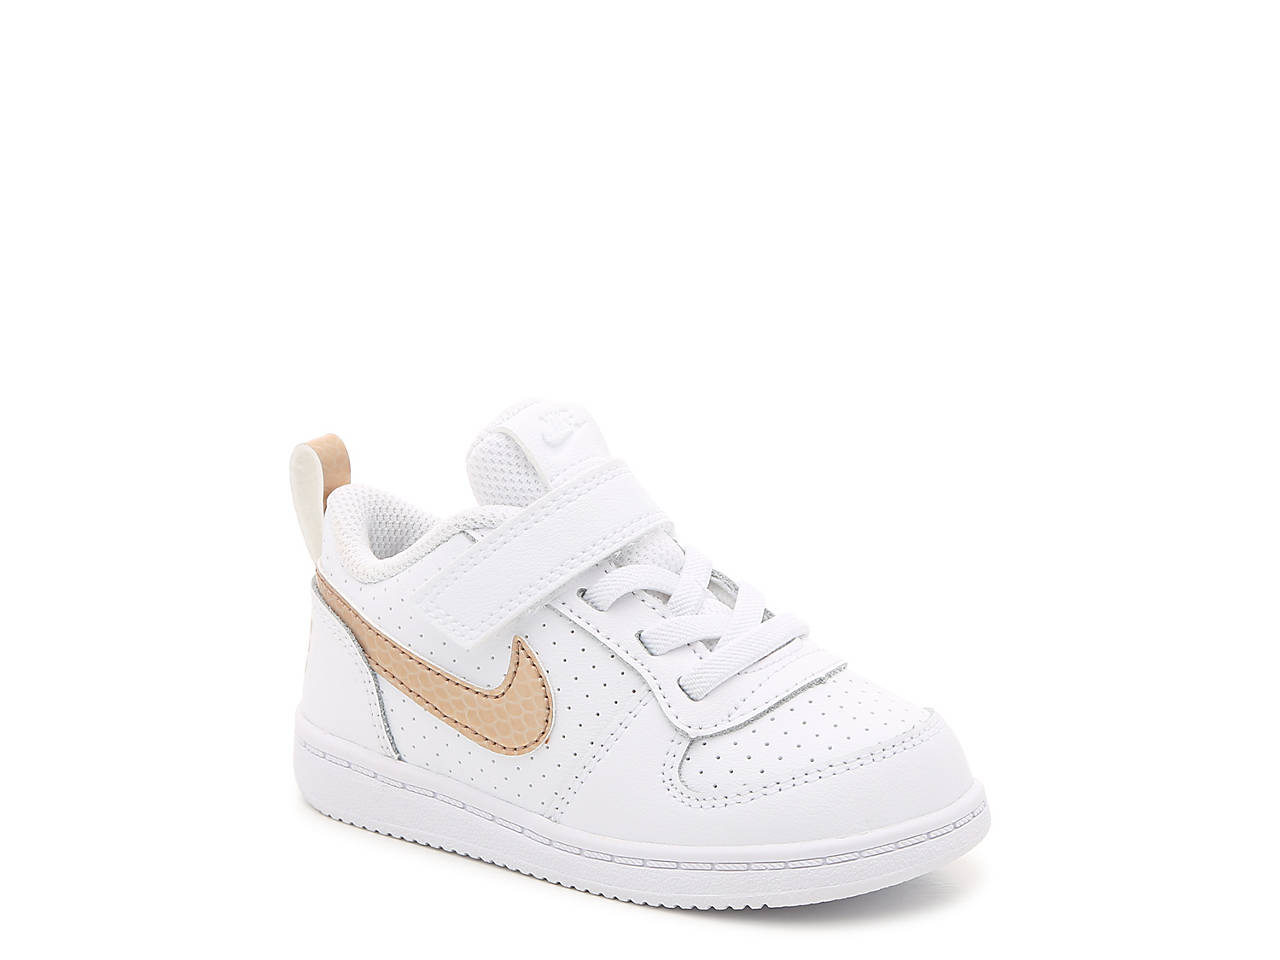 Borough Kids ShoesDsw Court Kids' Sneaker Nike dCxBerEQoW